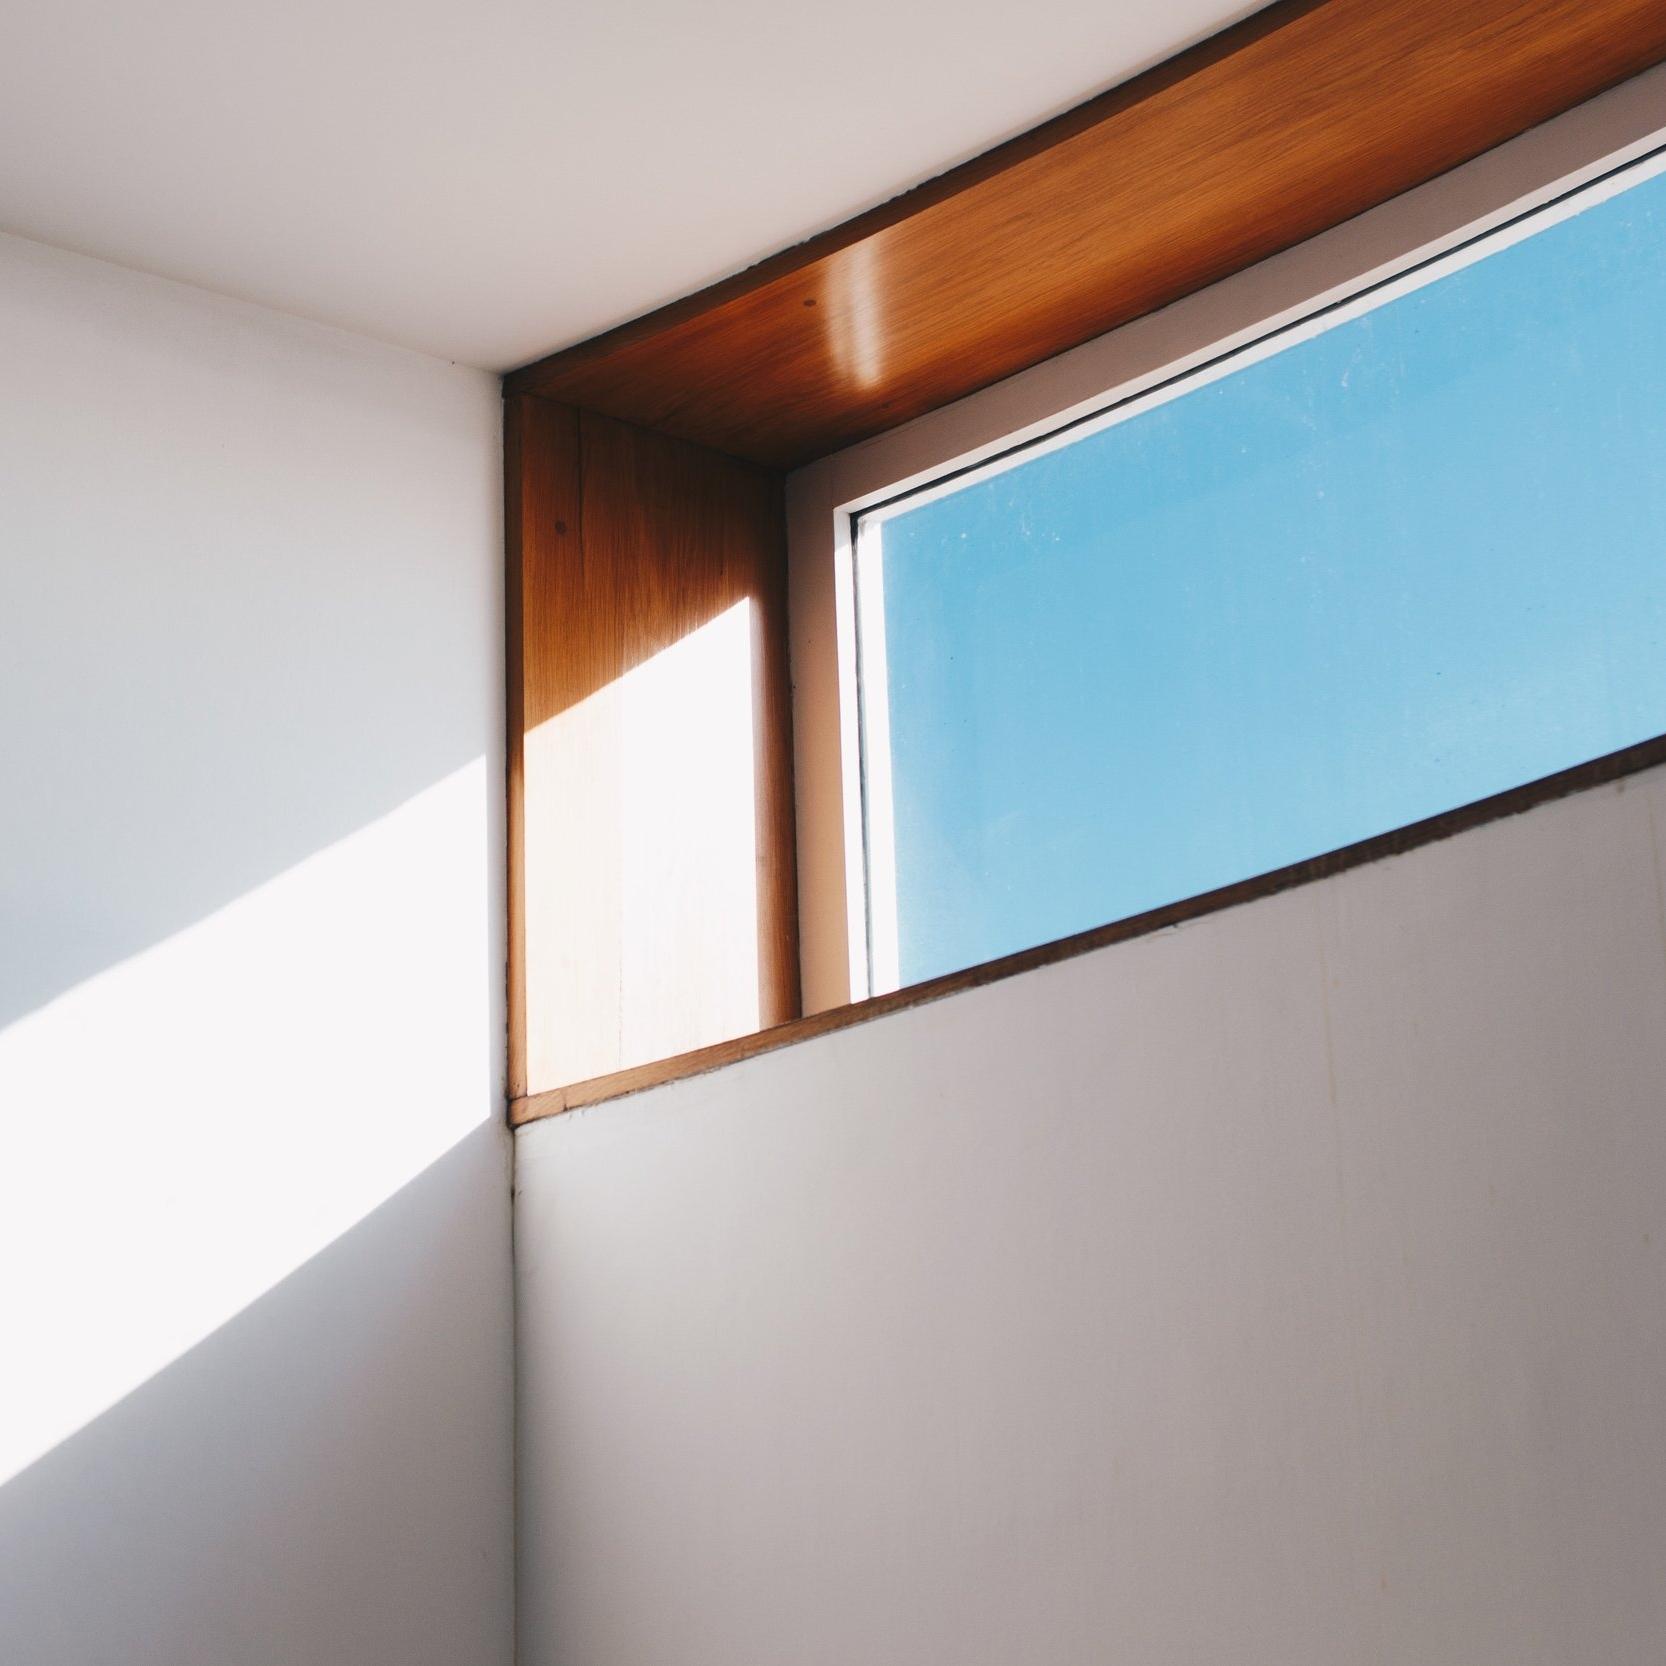 architecture-blank-space-blue-sky-921294.jpg